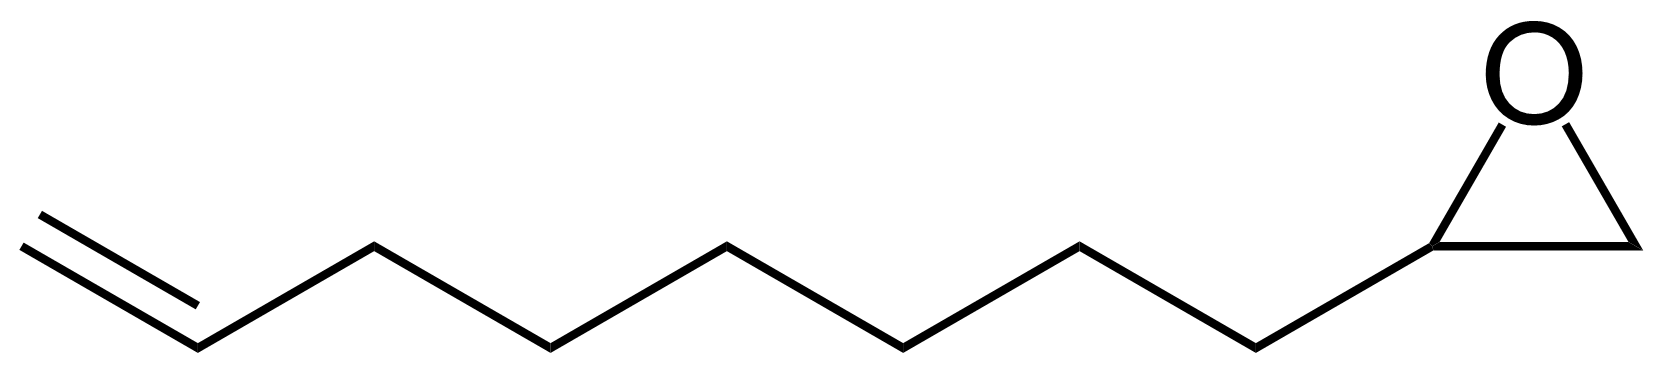 Structure of 1,2-Epoxy-9-decene